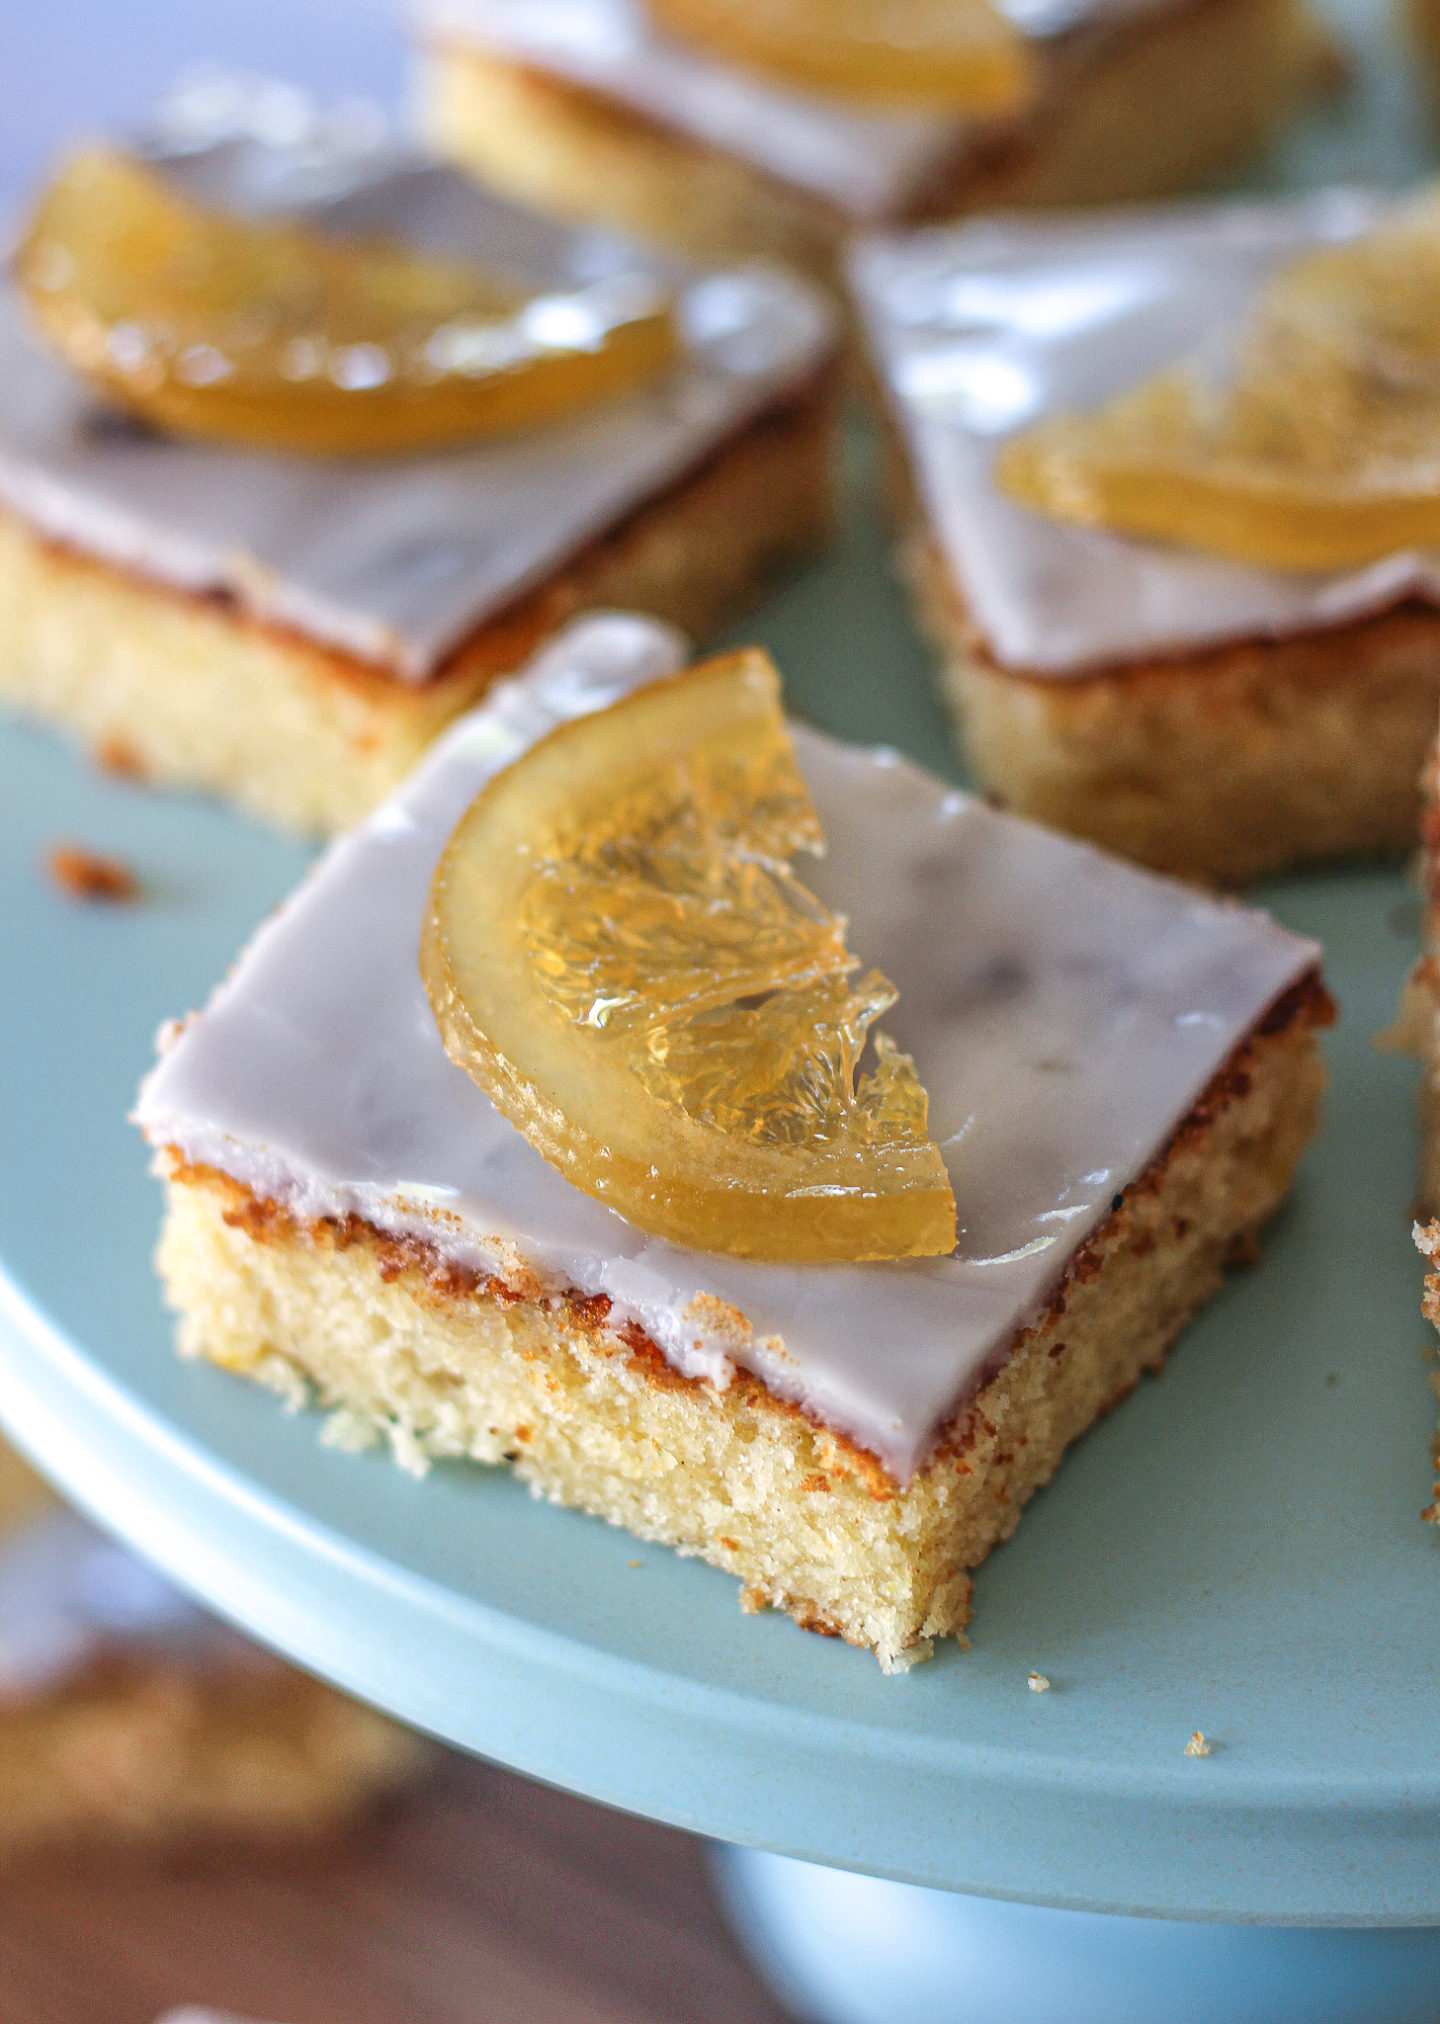 The Bake Off Box: Lemony Lemon Slices